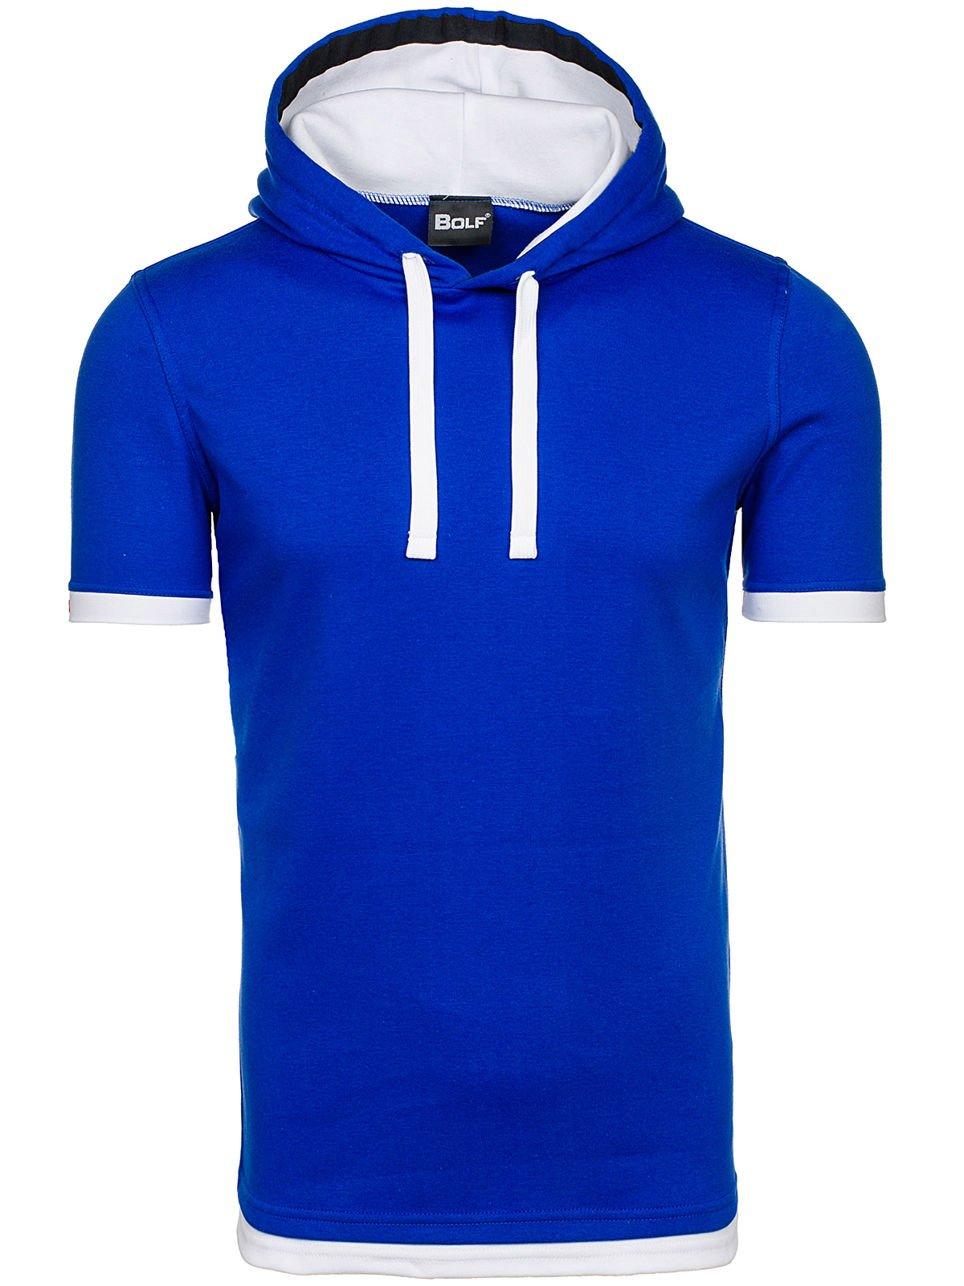 BOLF Herren T-Shirt Tee Kurzarm Sommer Classic Aufdruck Slim Kapuze BOLF 08  3C3 Motiv: Amazon.de: Bekleidung